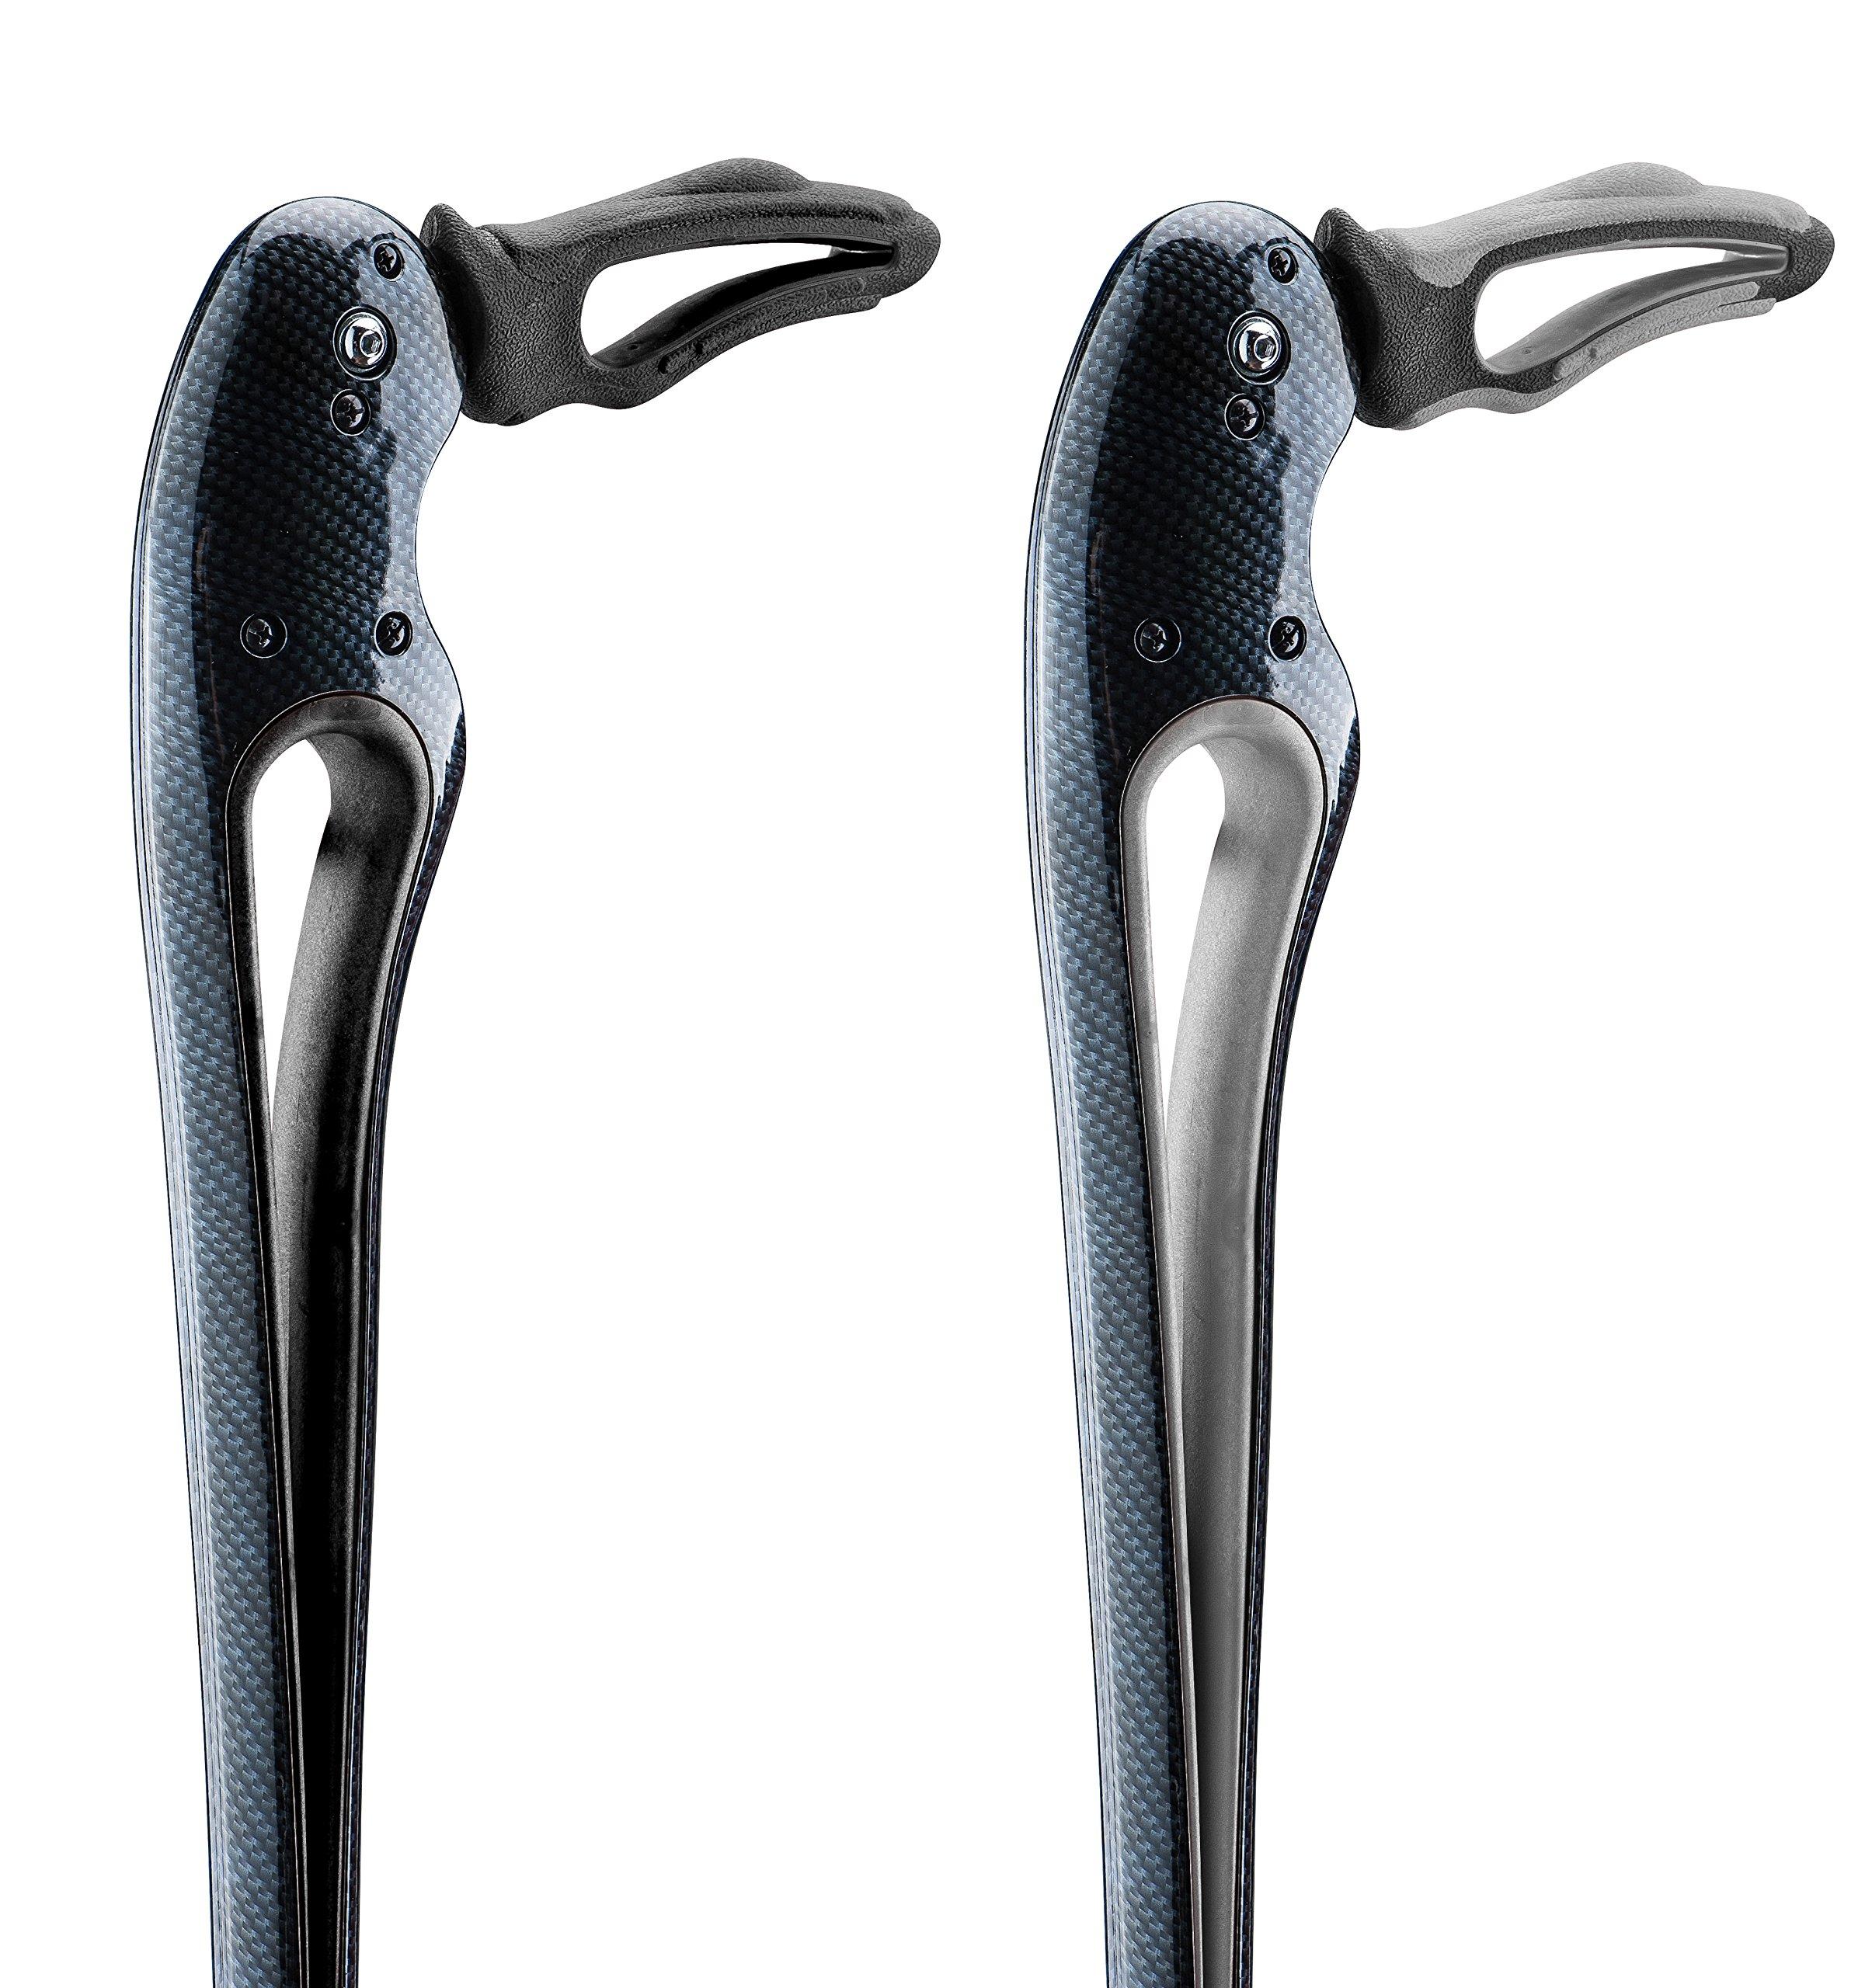 Tucane® Advanced Walking Stick- ''Your Third Hip'' (Small 4'8'' to 5'3'') (Black/Black)